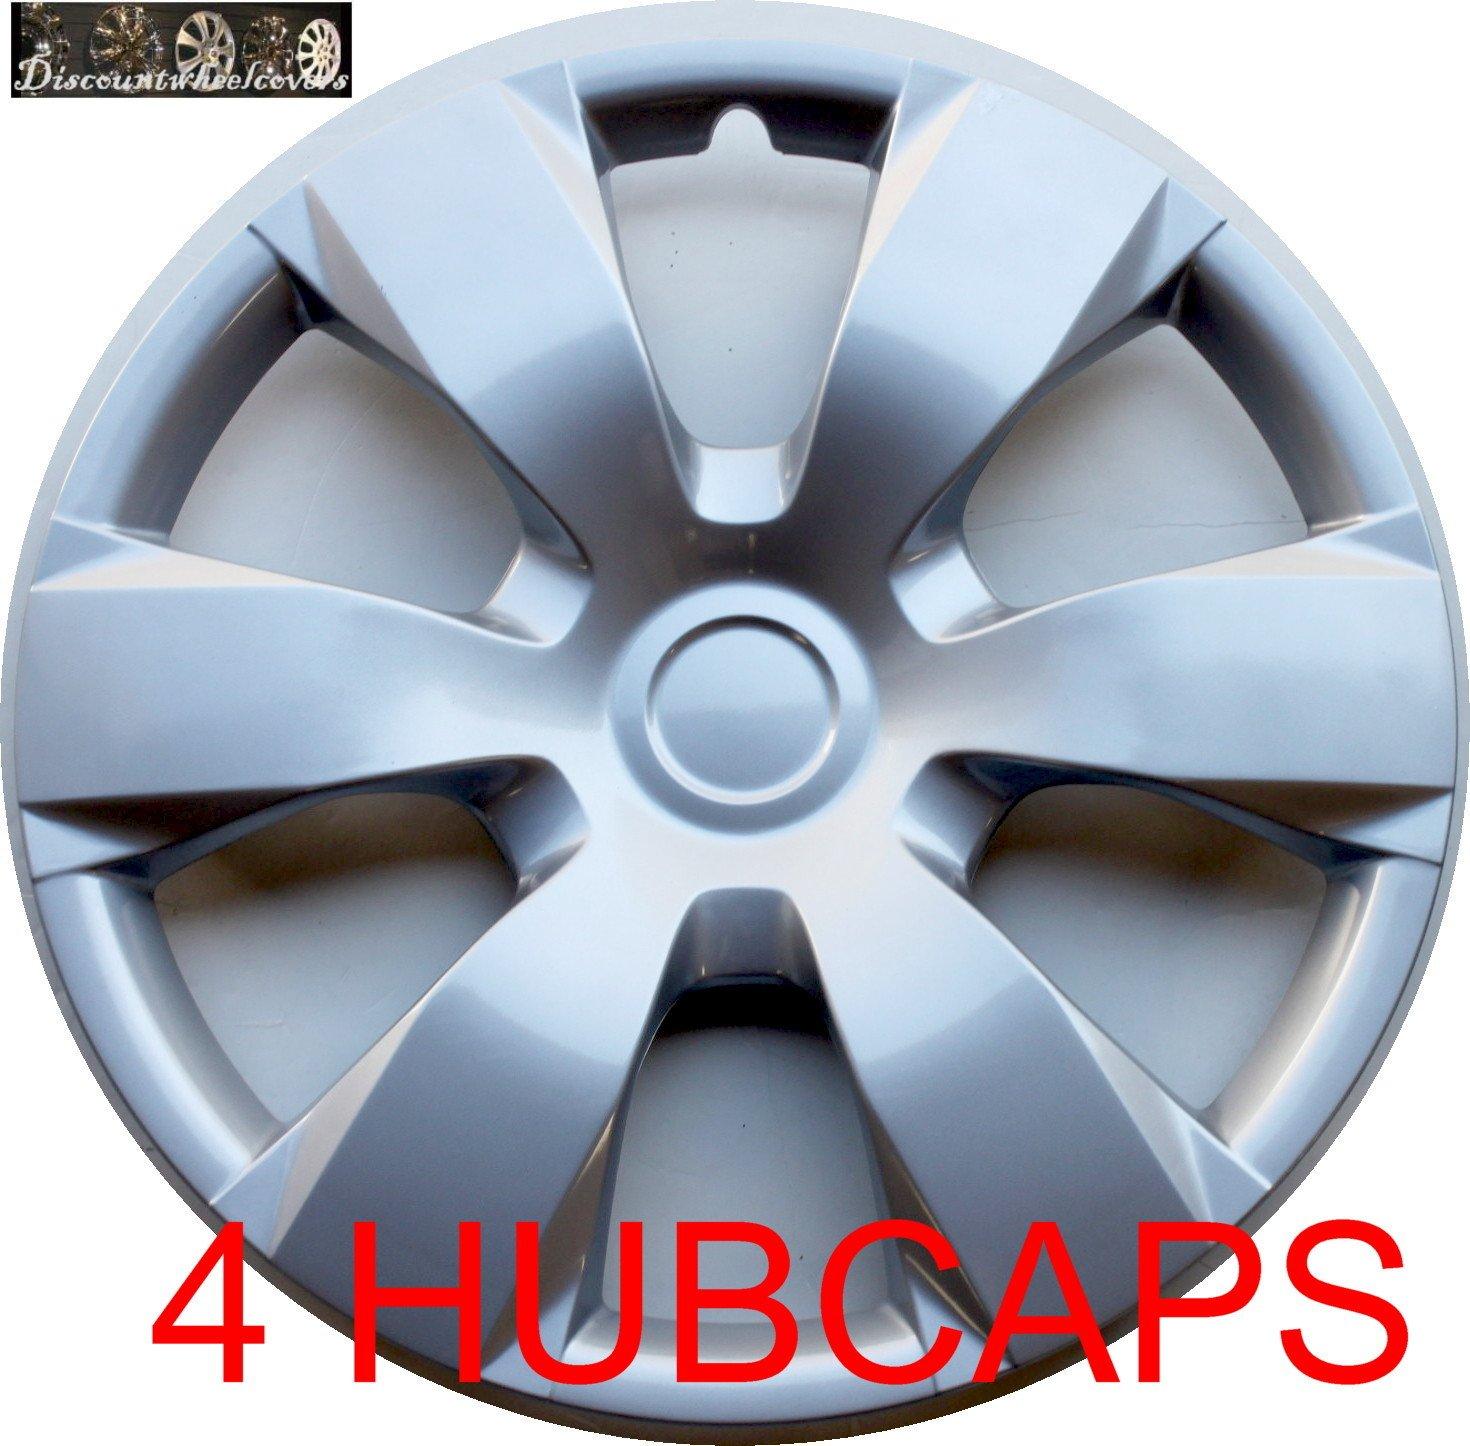 16 set of 4 hubcaps fit 2006 2011 toyota camry matrix wheel autos weblog. Black Bedroom Furniture Sets. Home Design Ideas